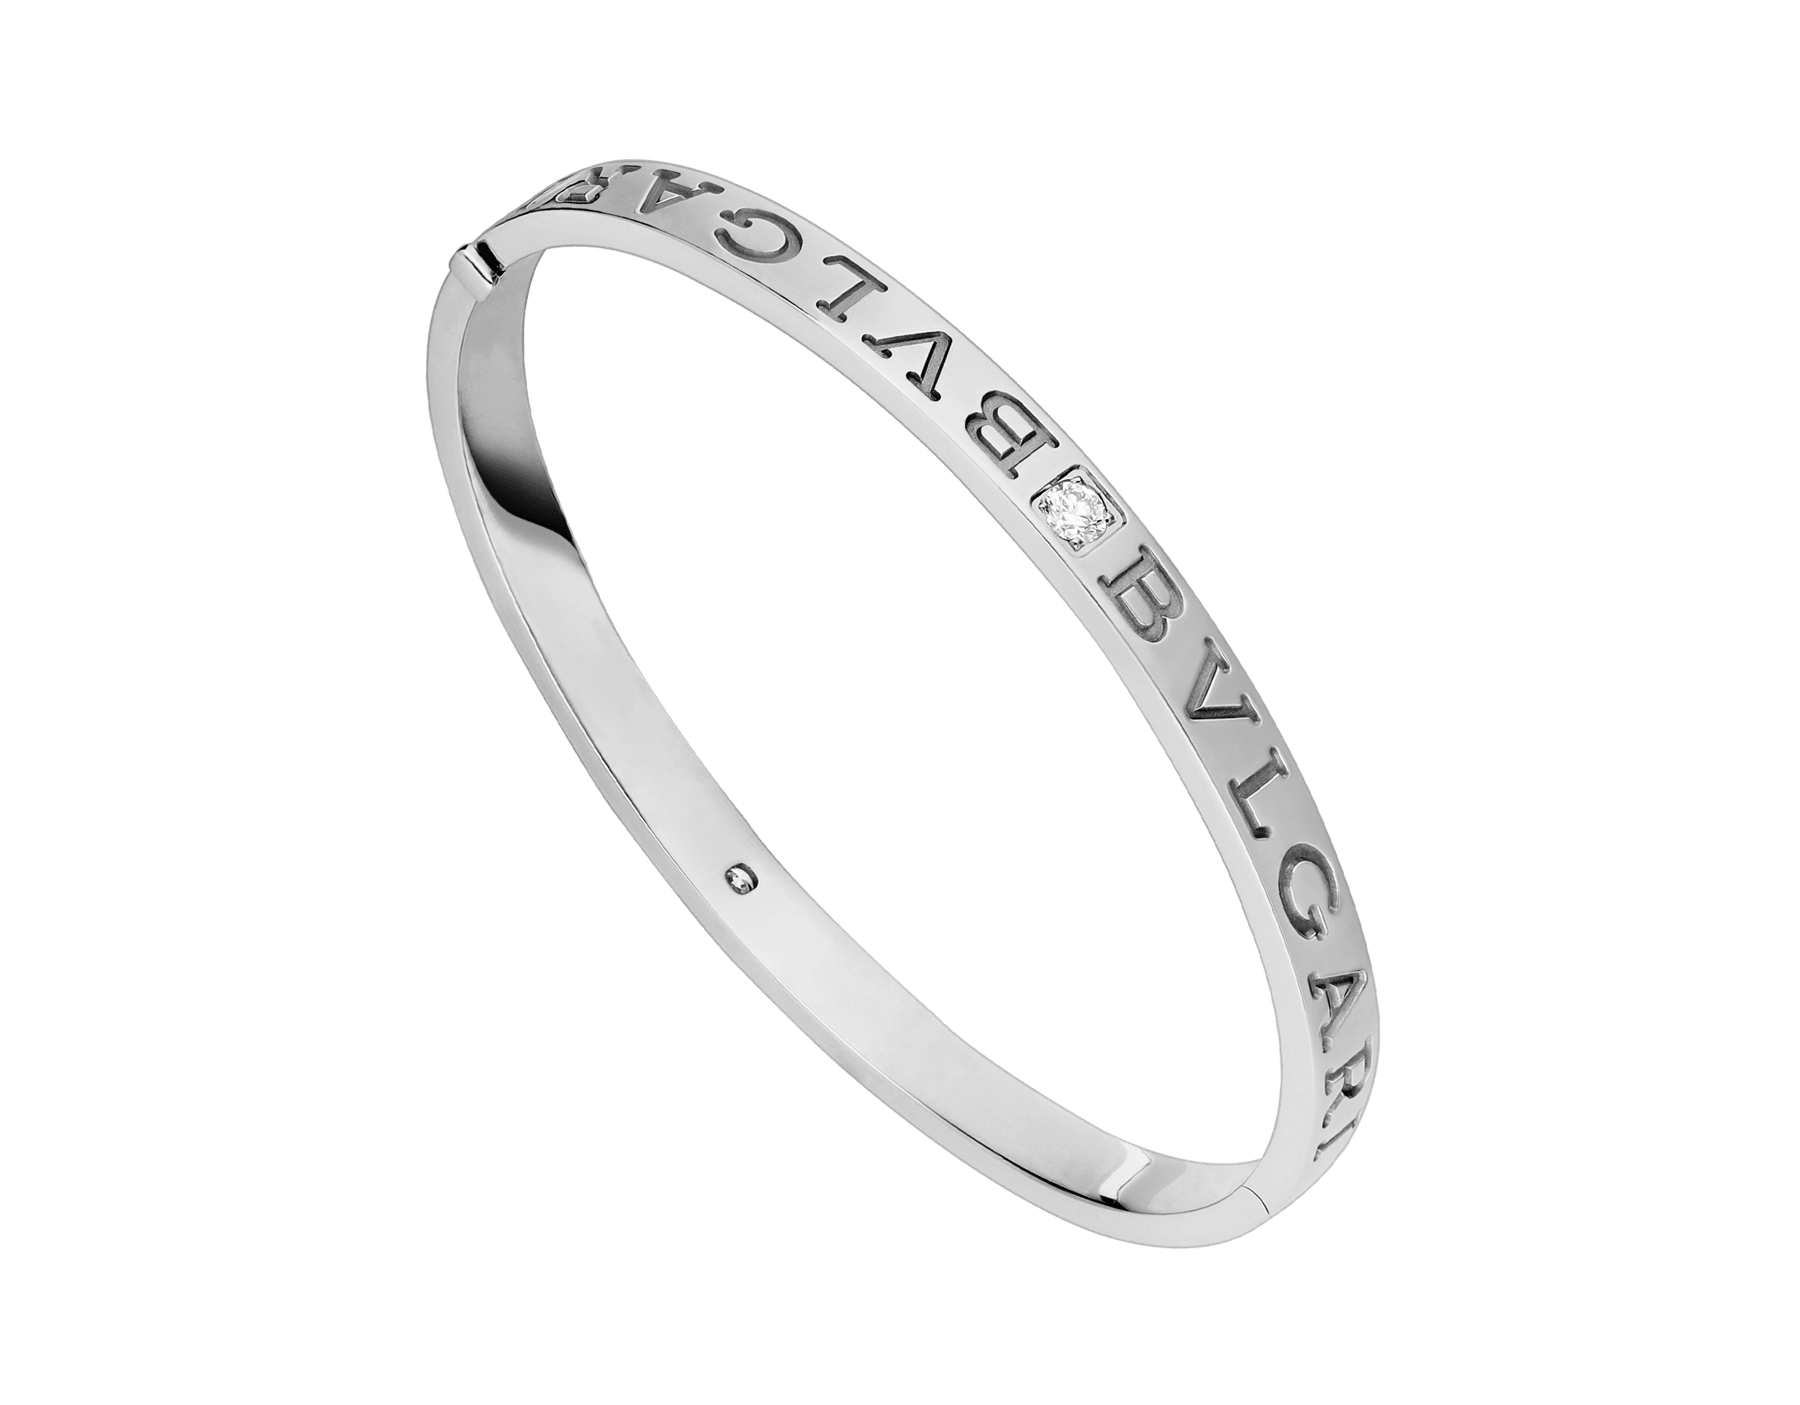 BVLGARI BVLGARI 18 kt white gold bangle bracelet set with diamonds BR856790 image 1